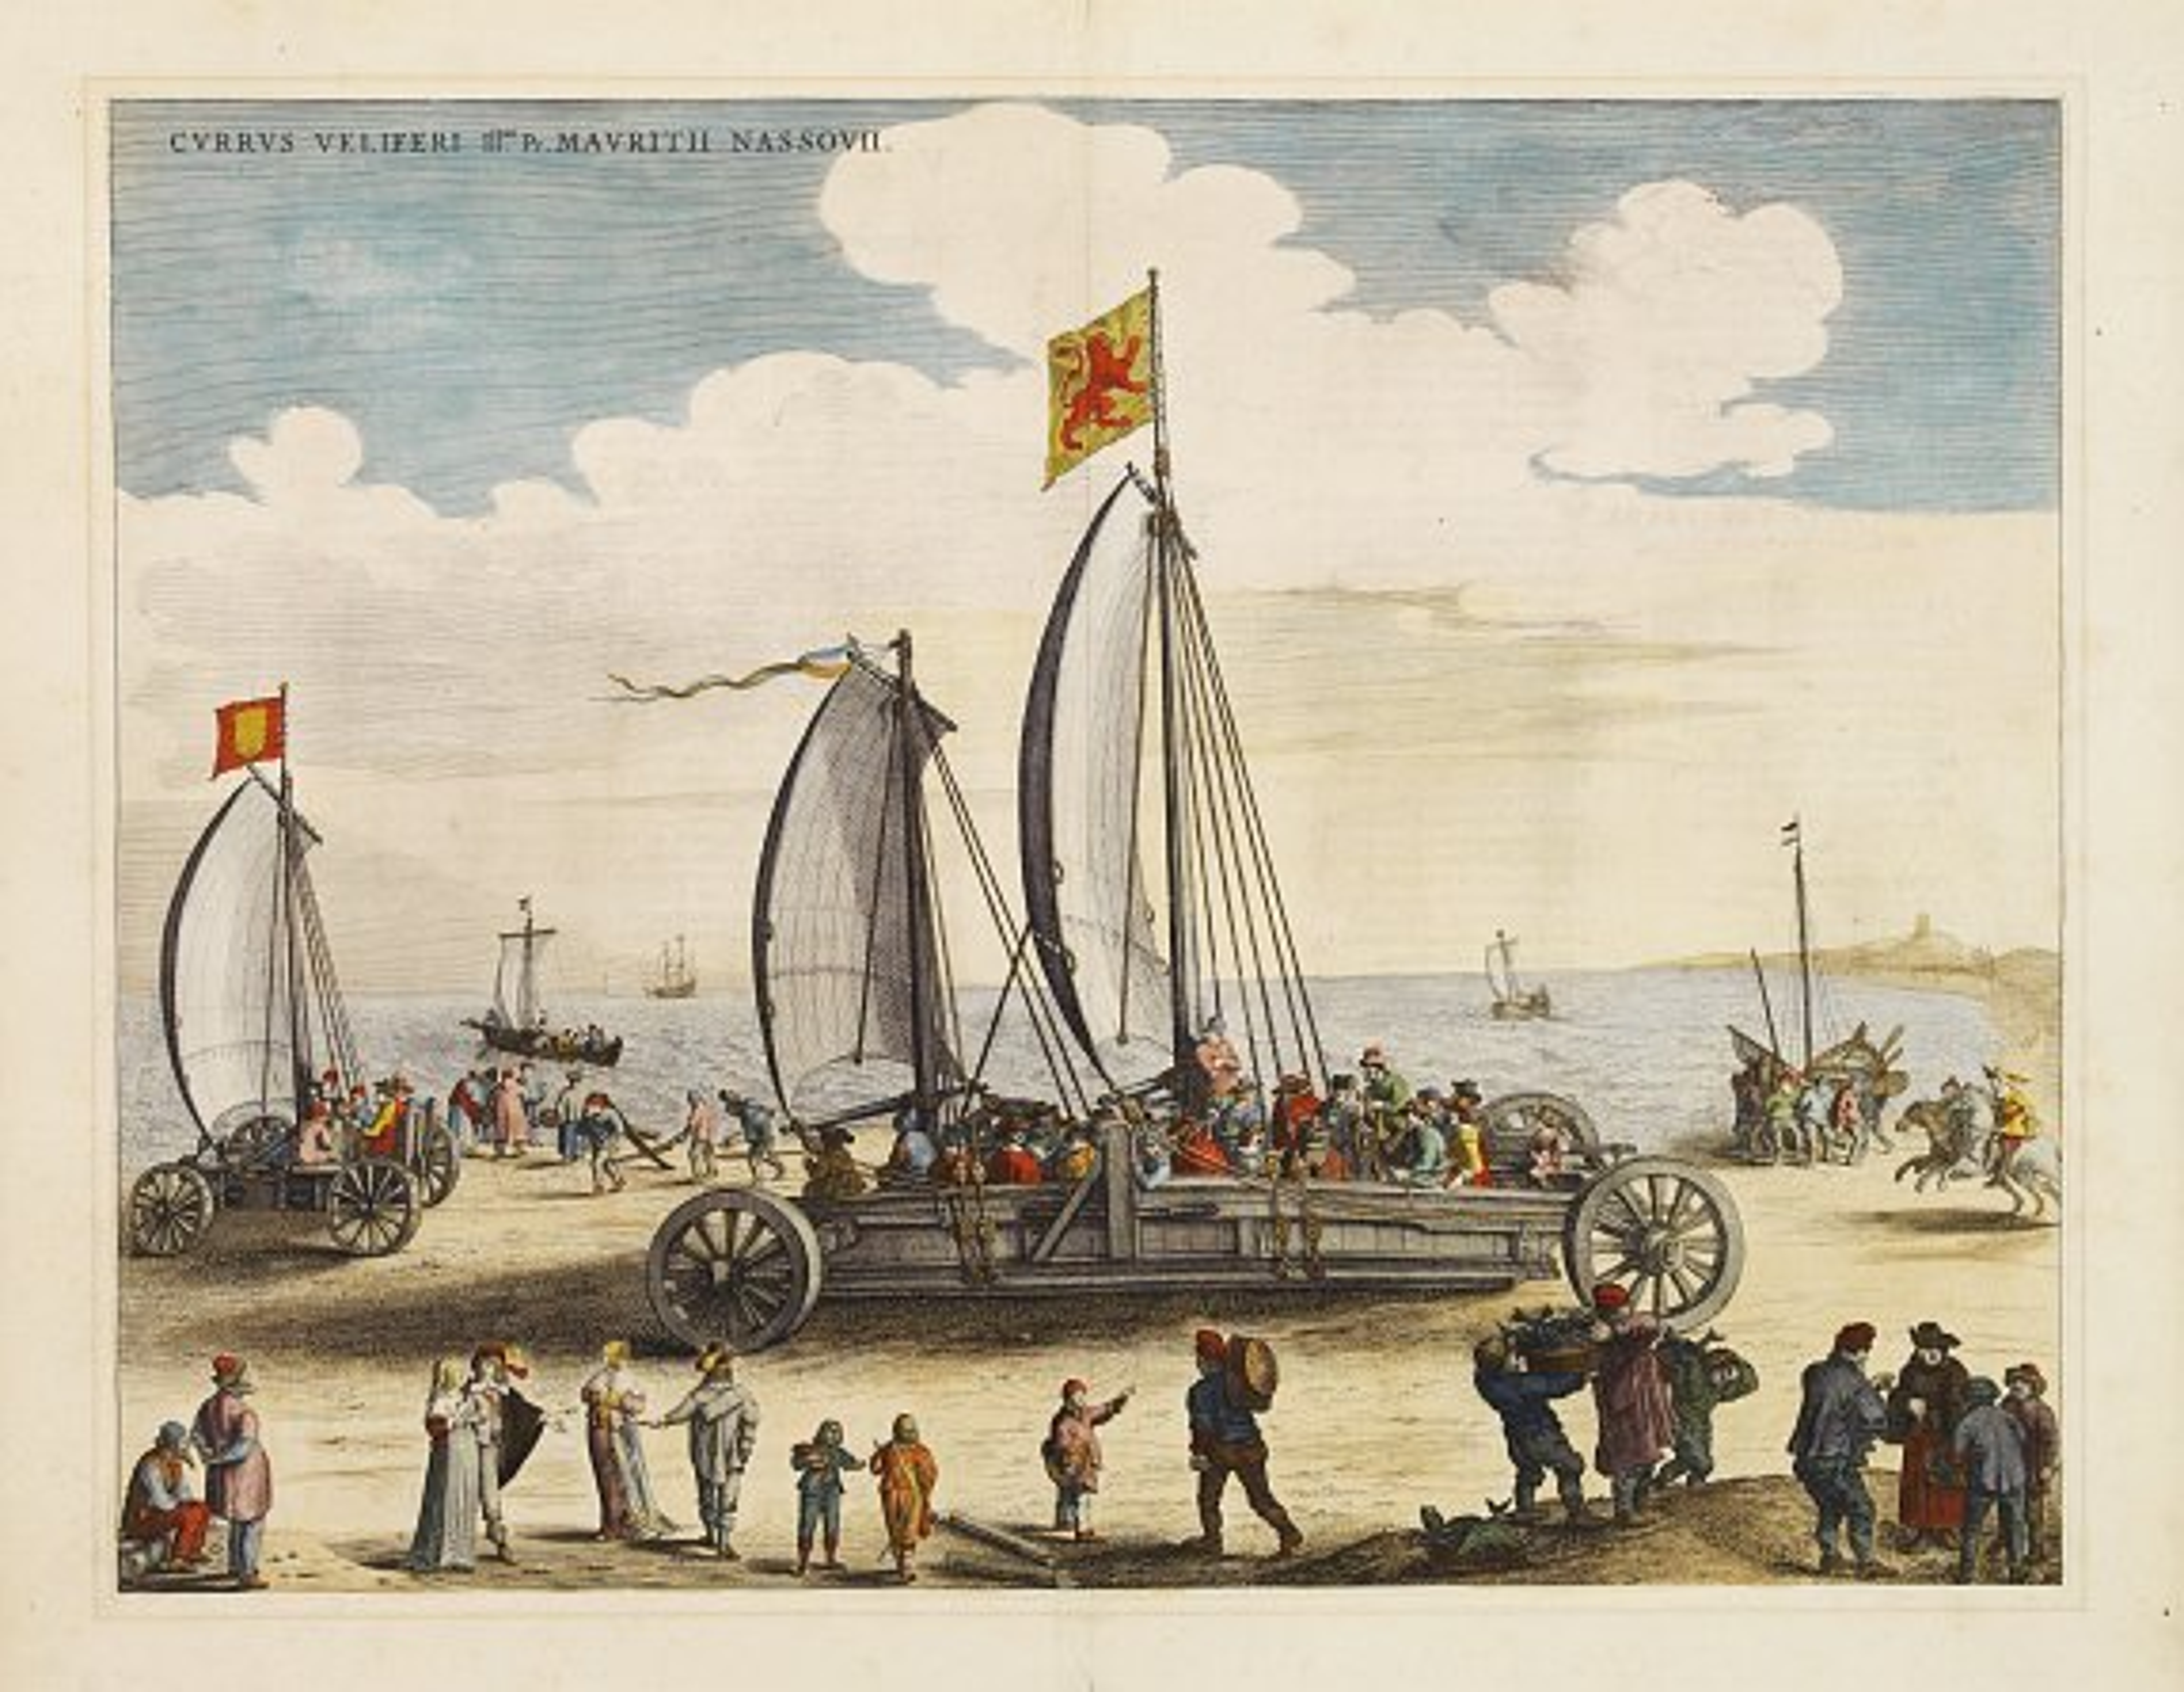 BLAEU, J. -  Currus Veliferi Illmi. Pr. Mauritii Nassouvii. (Prince Maurits' sailing-carriage, designed by Simon Stevin. )